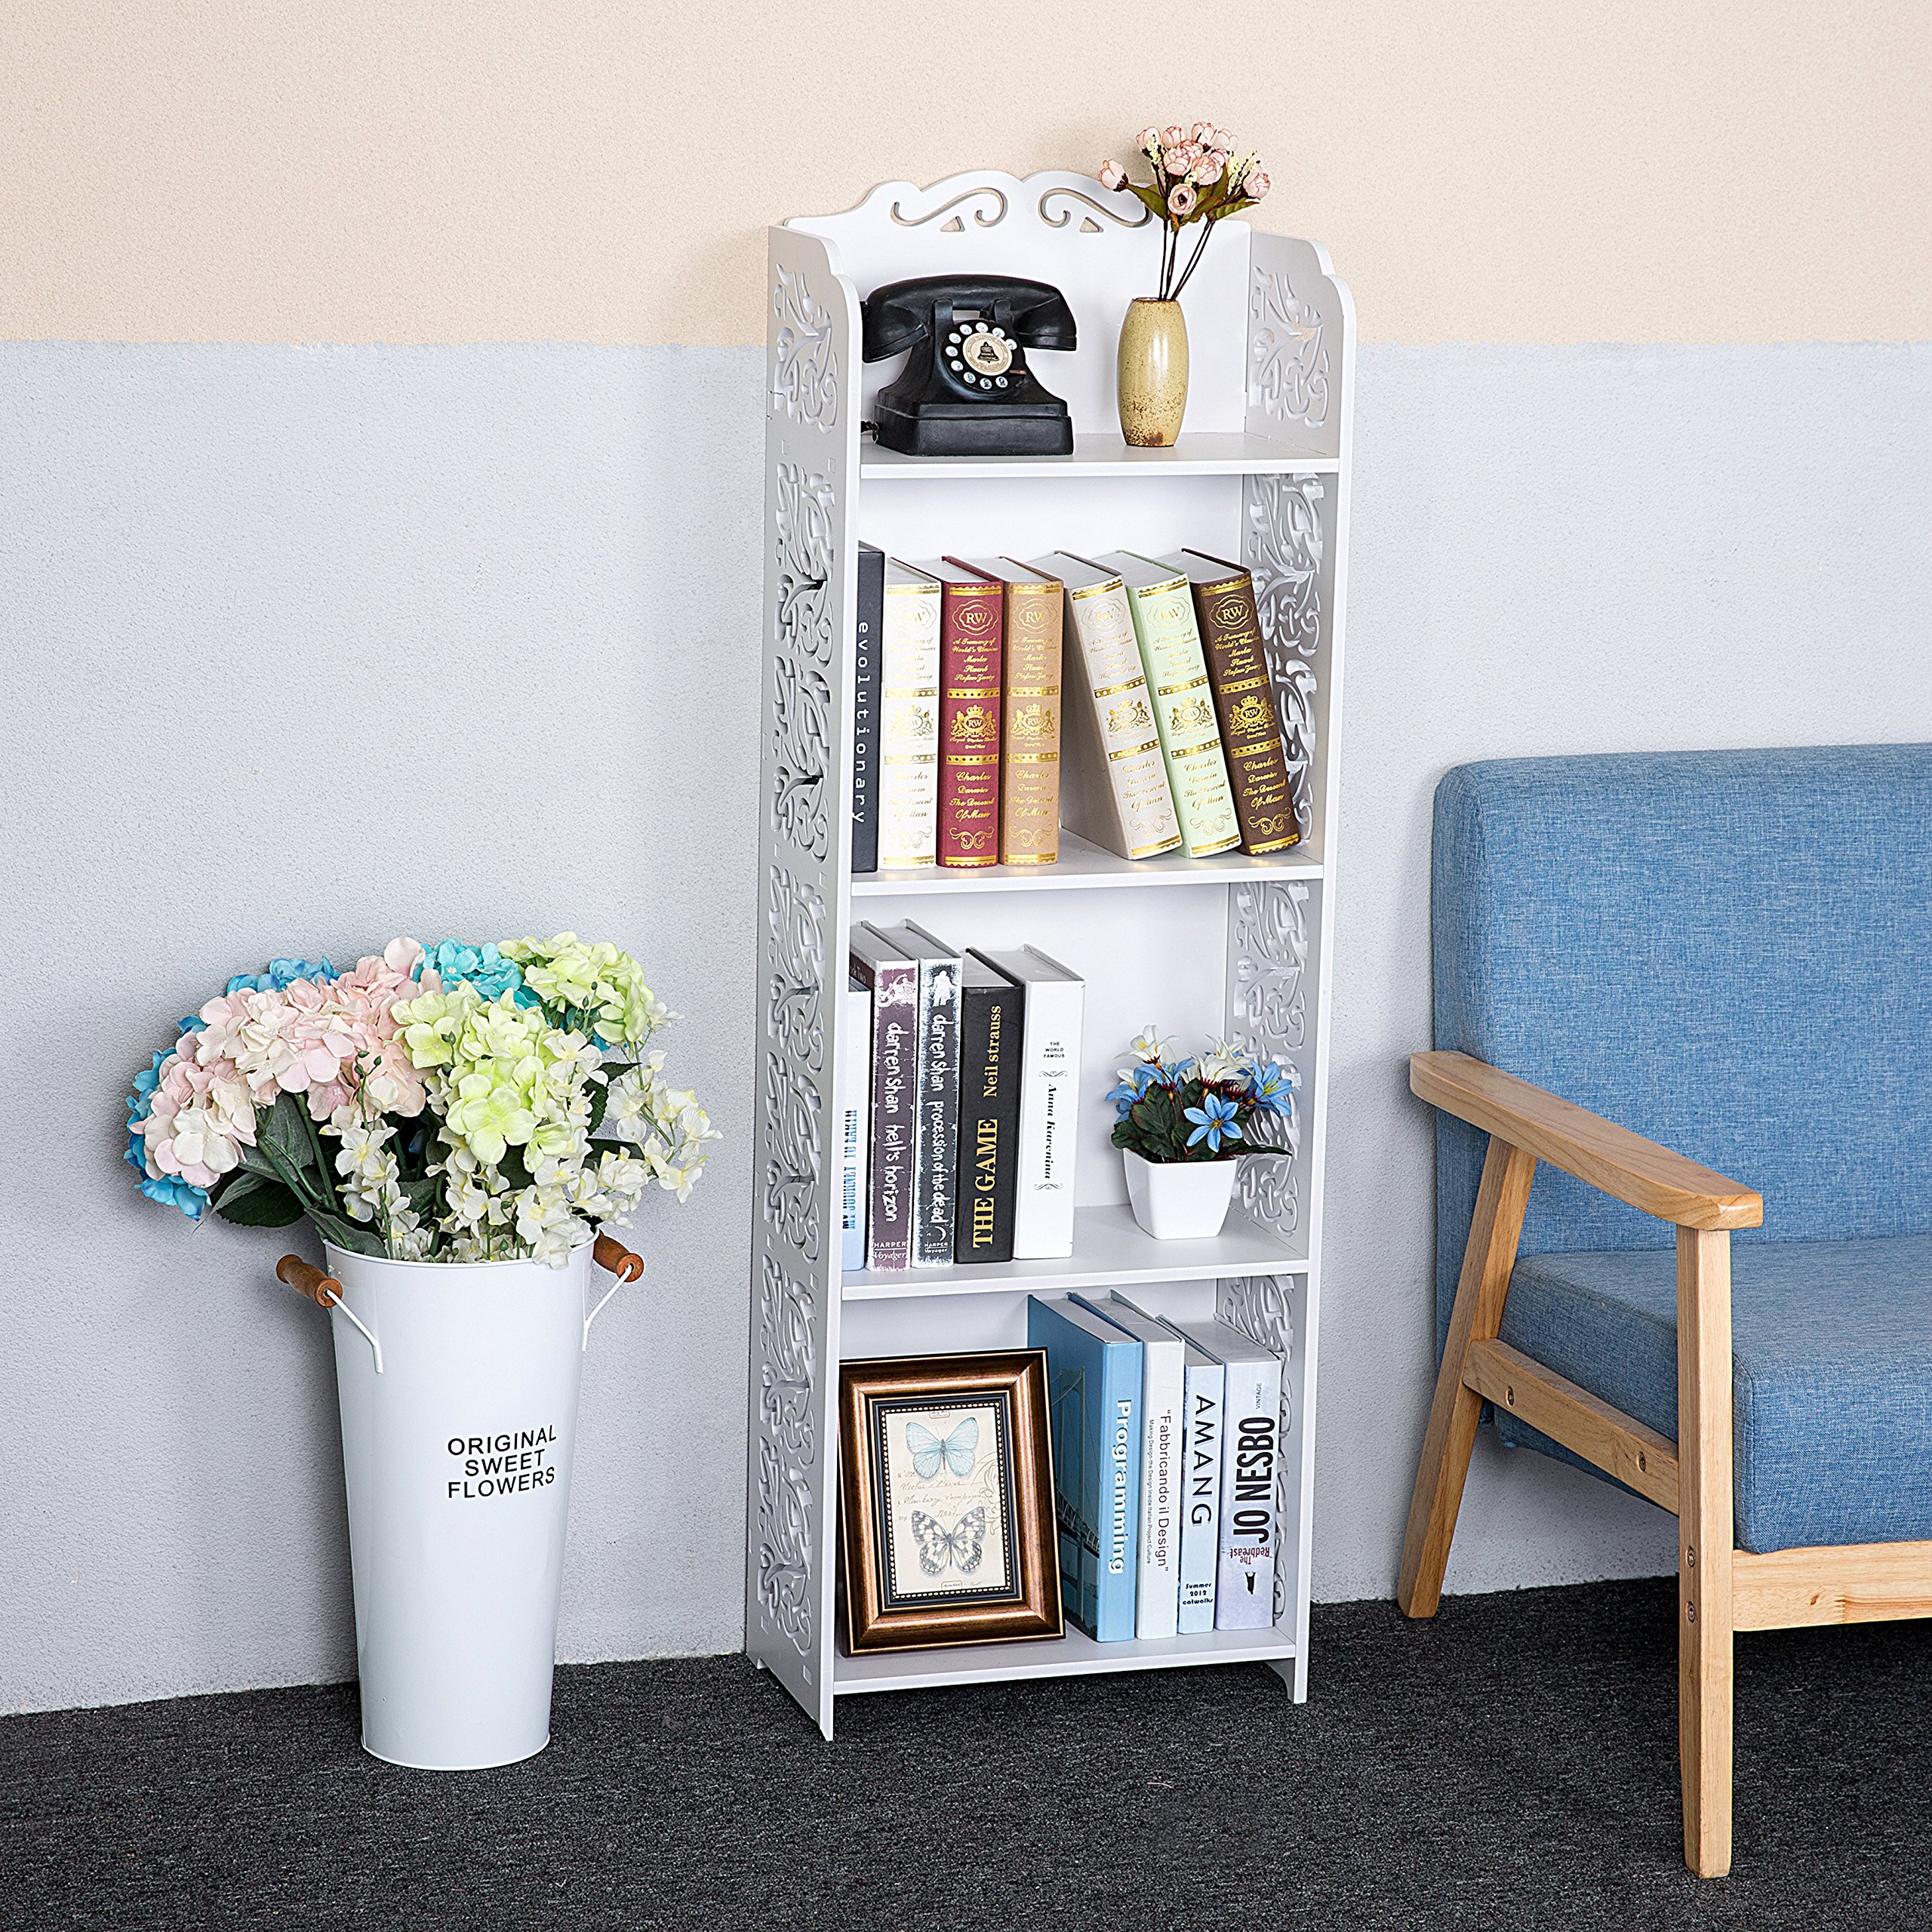 C&AHOME 4 Tier DIY Storage Rack Portable Bathroom Shelf Organizer Shoe Rack Bookcase, White by C&AHOME